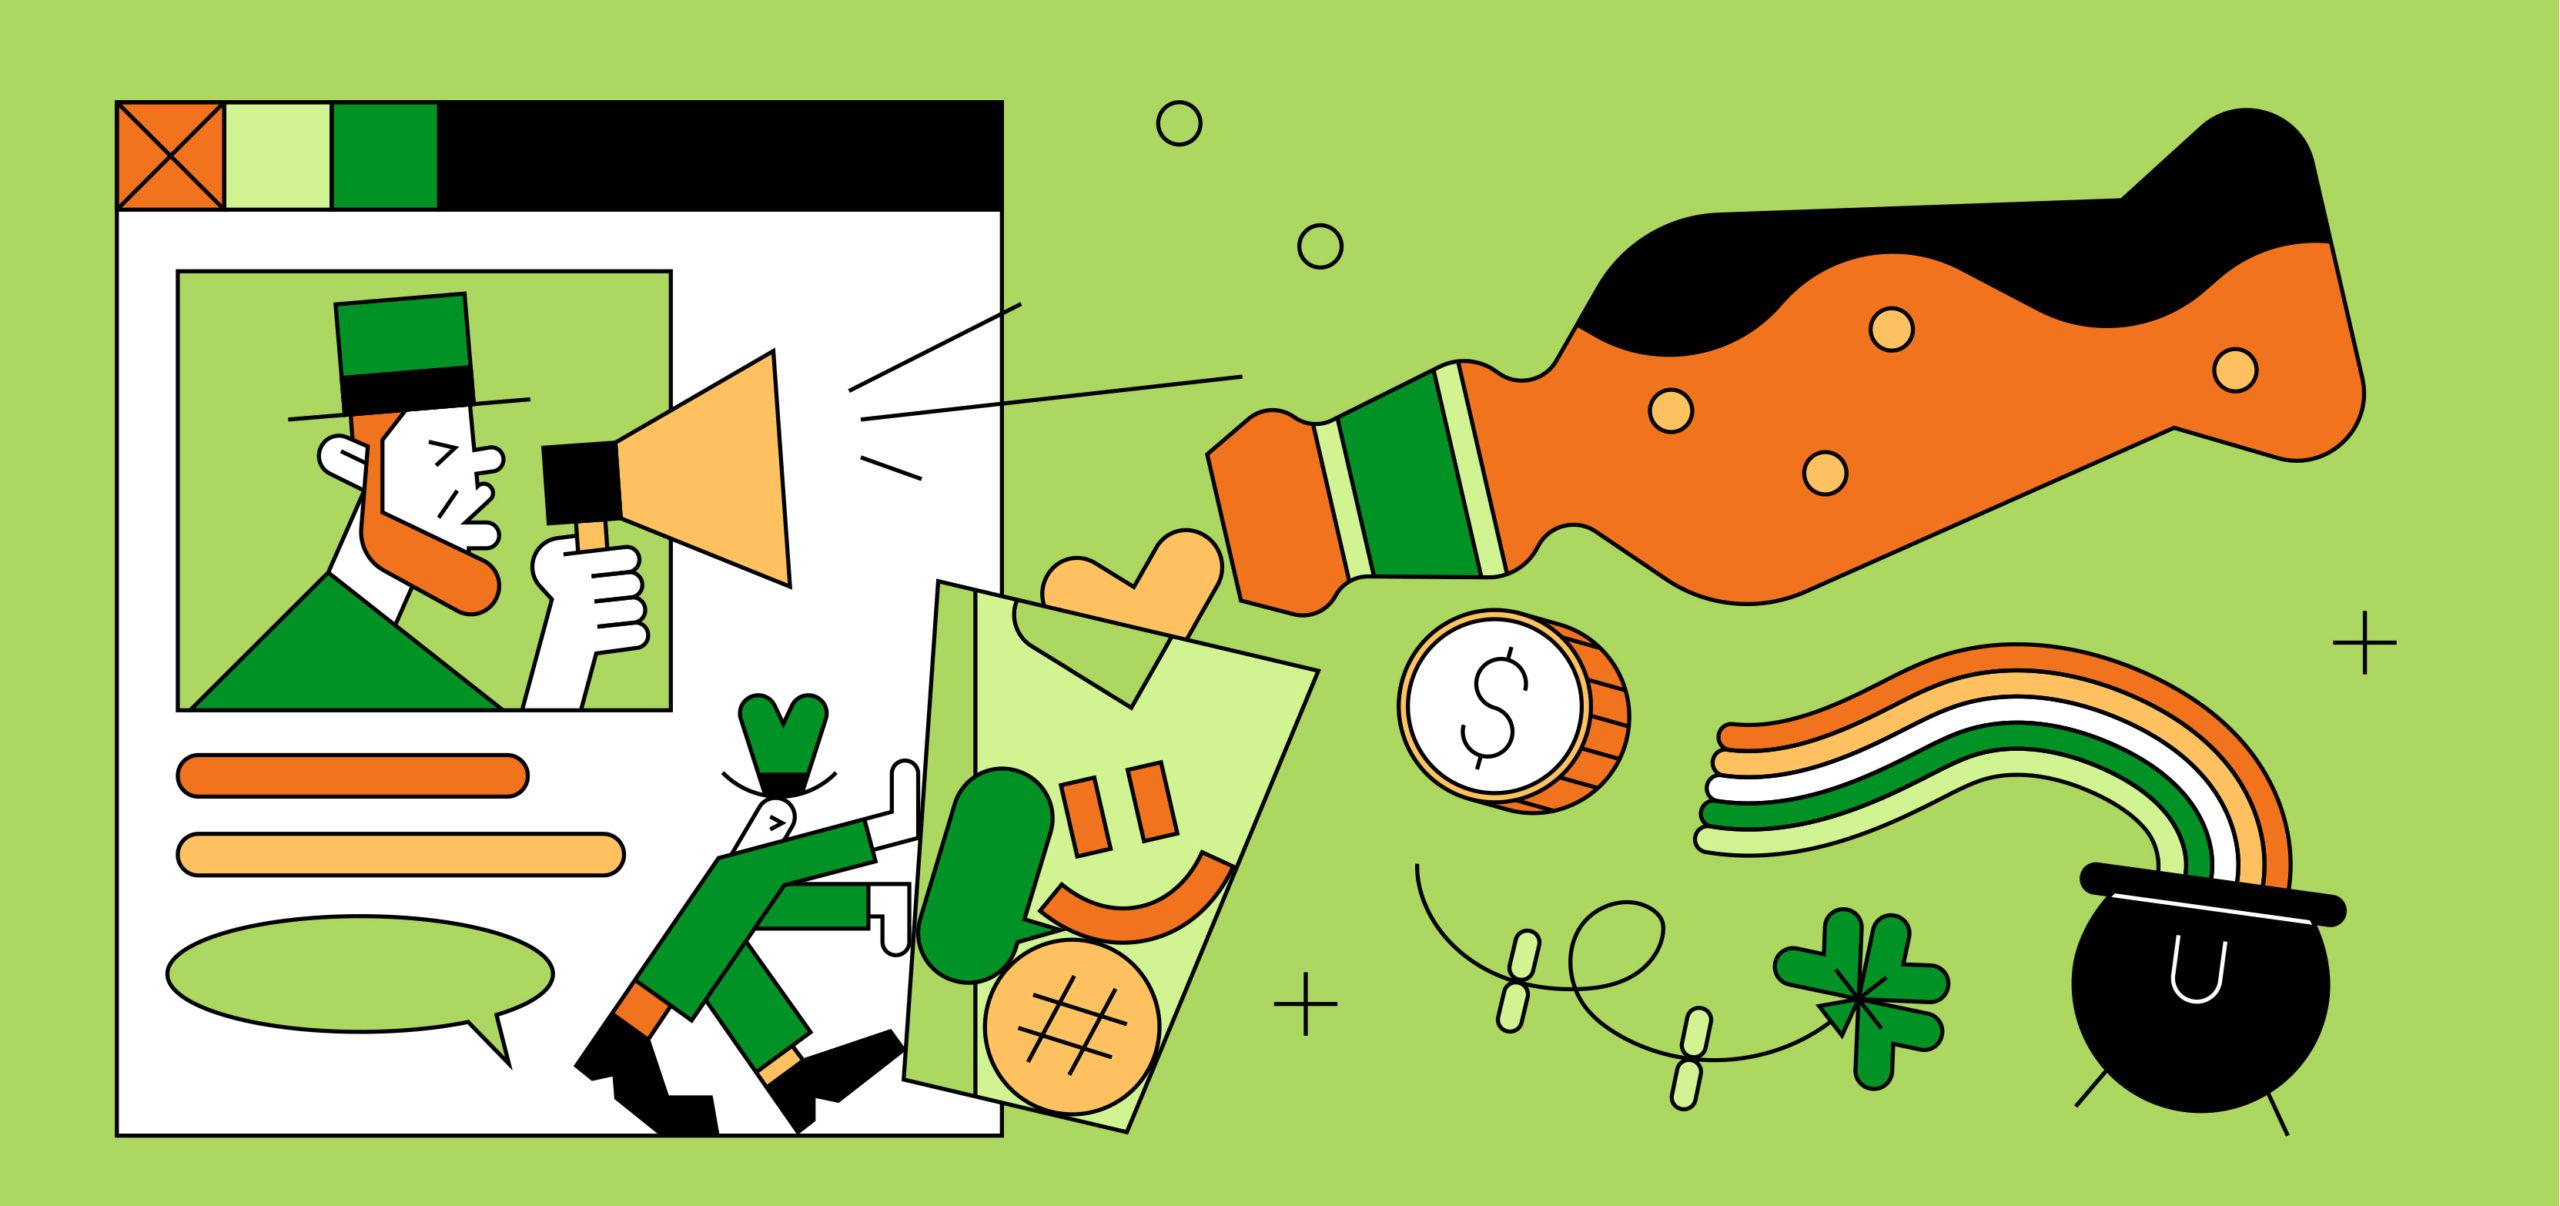 St. Patrick's Day themed illustration